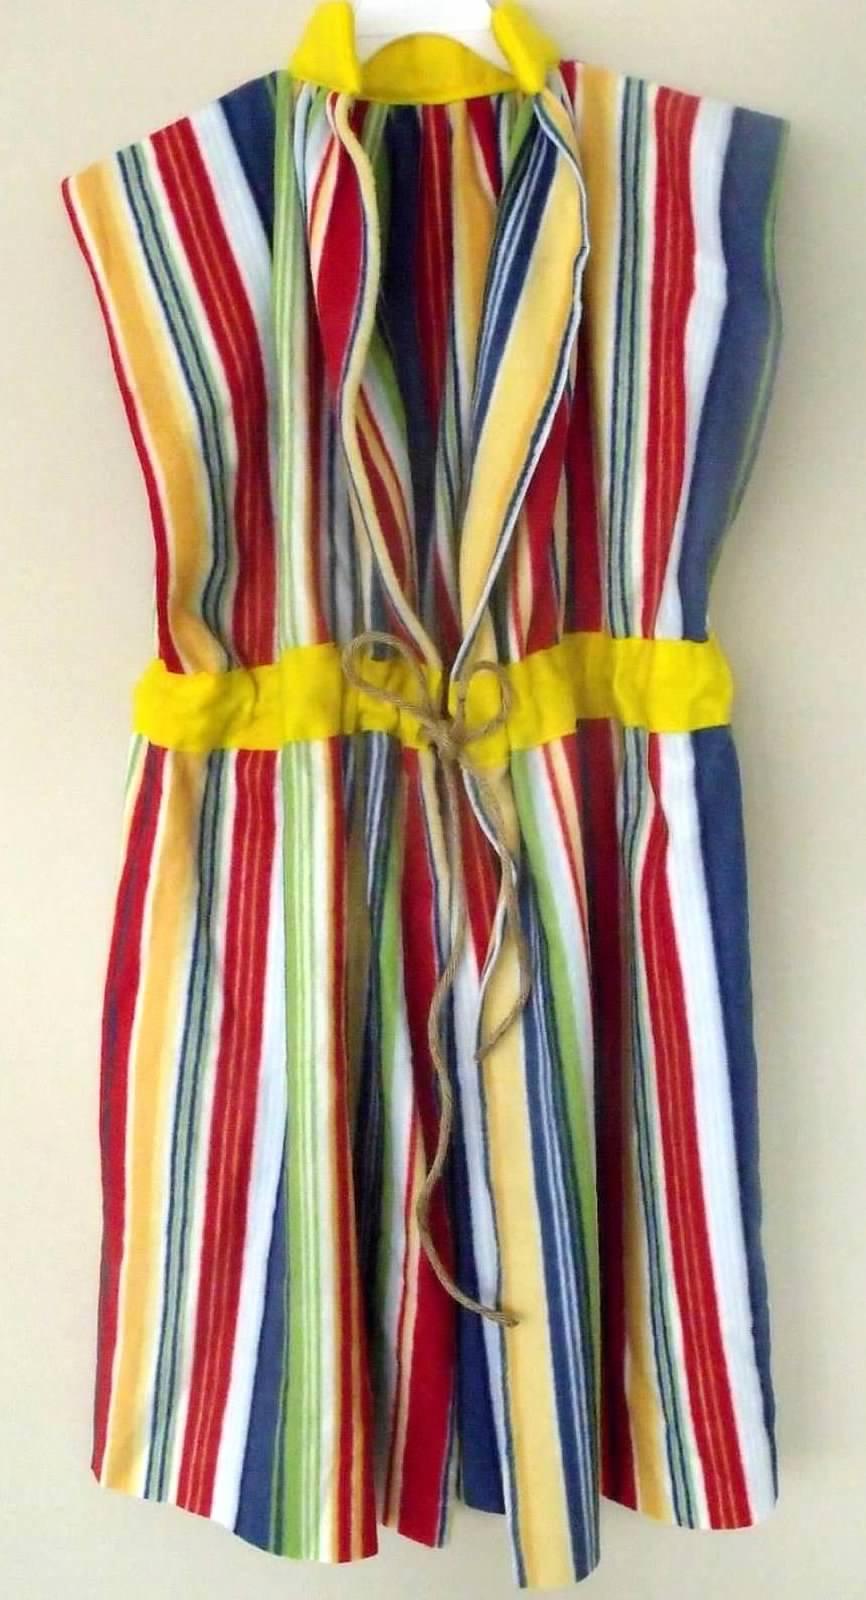 Bible Fun For Kids: Joseph's Colorful Coat File Folder Game